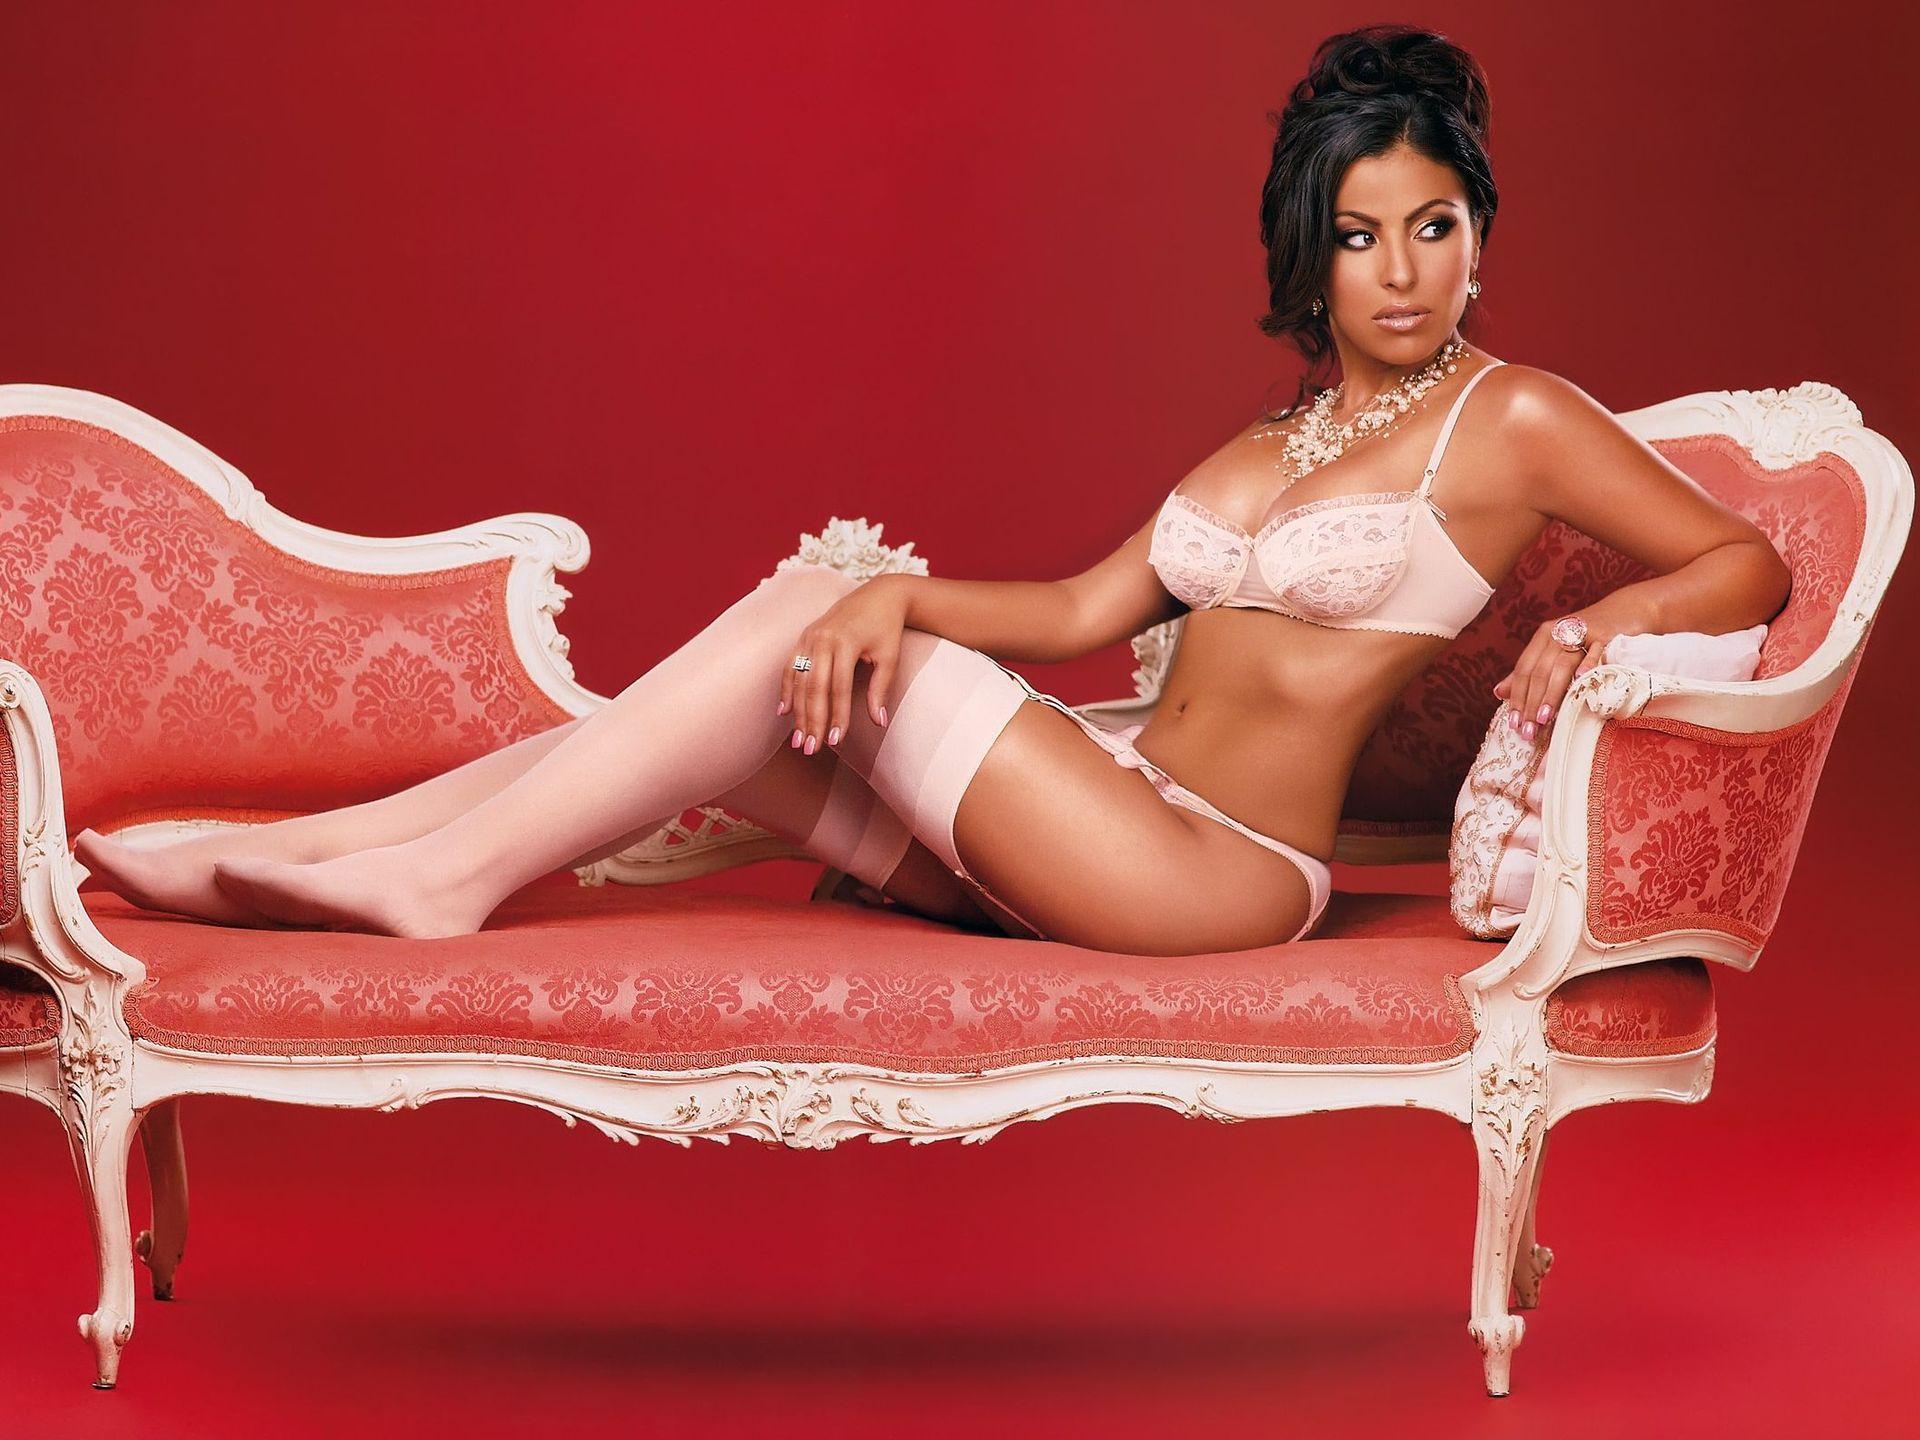 Секс в розовом диване 6 фотография